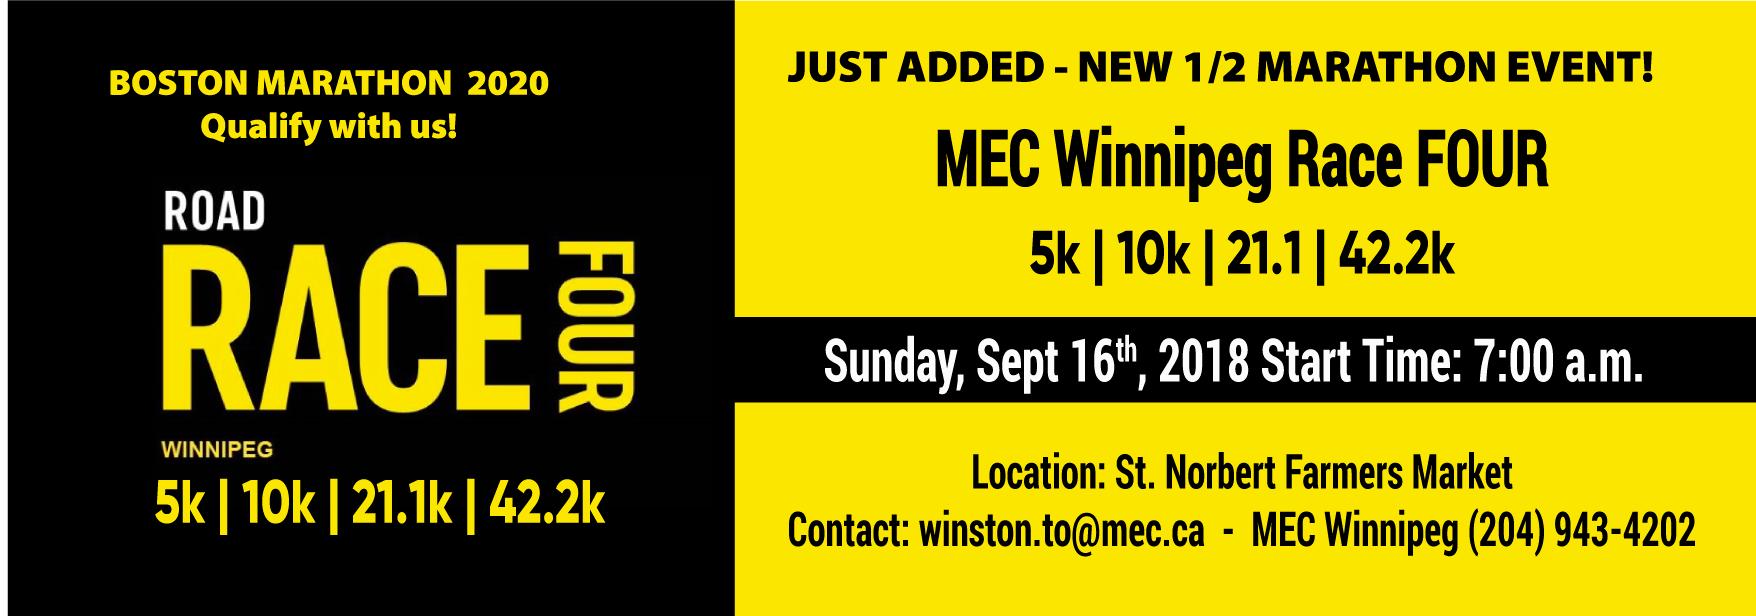 MEC Winnipeg Race Four